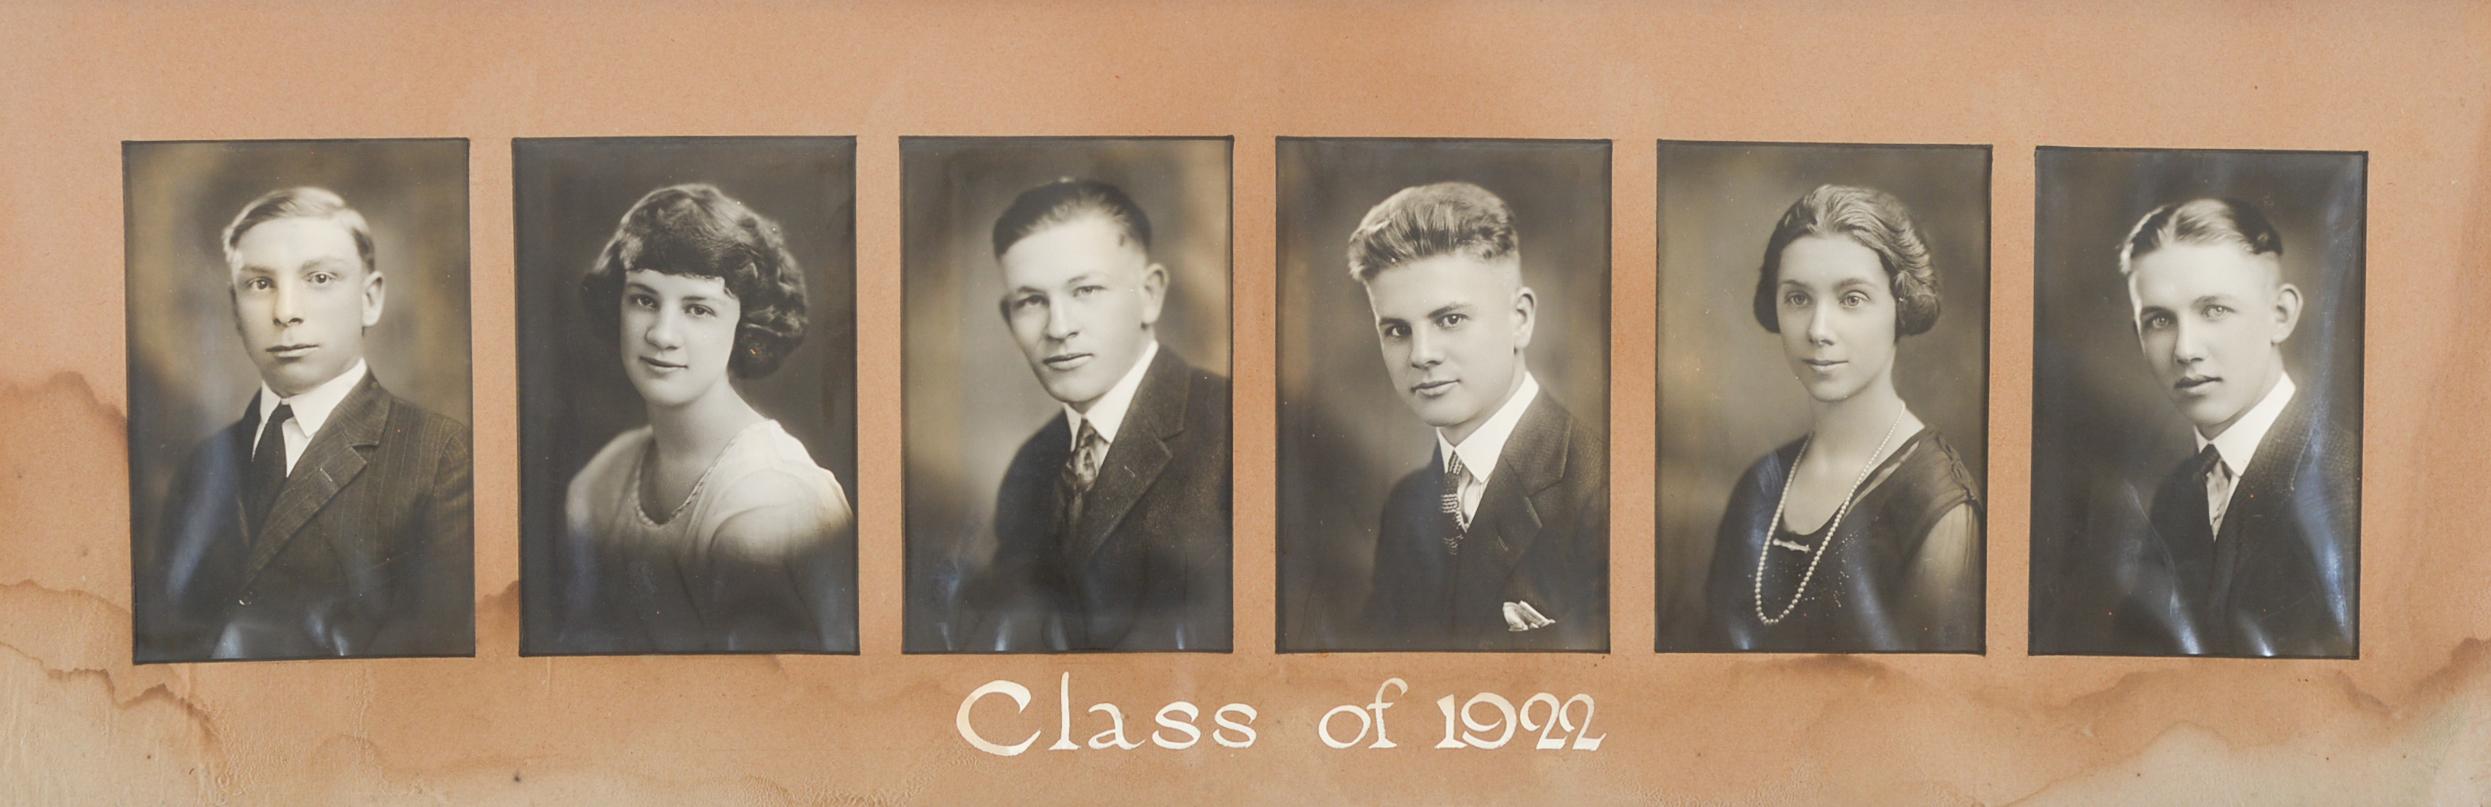 Class of 1922